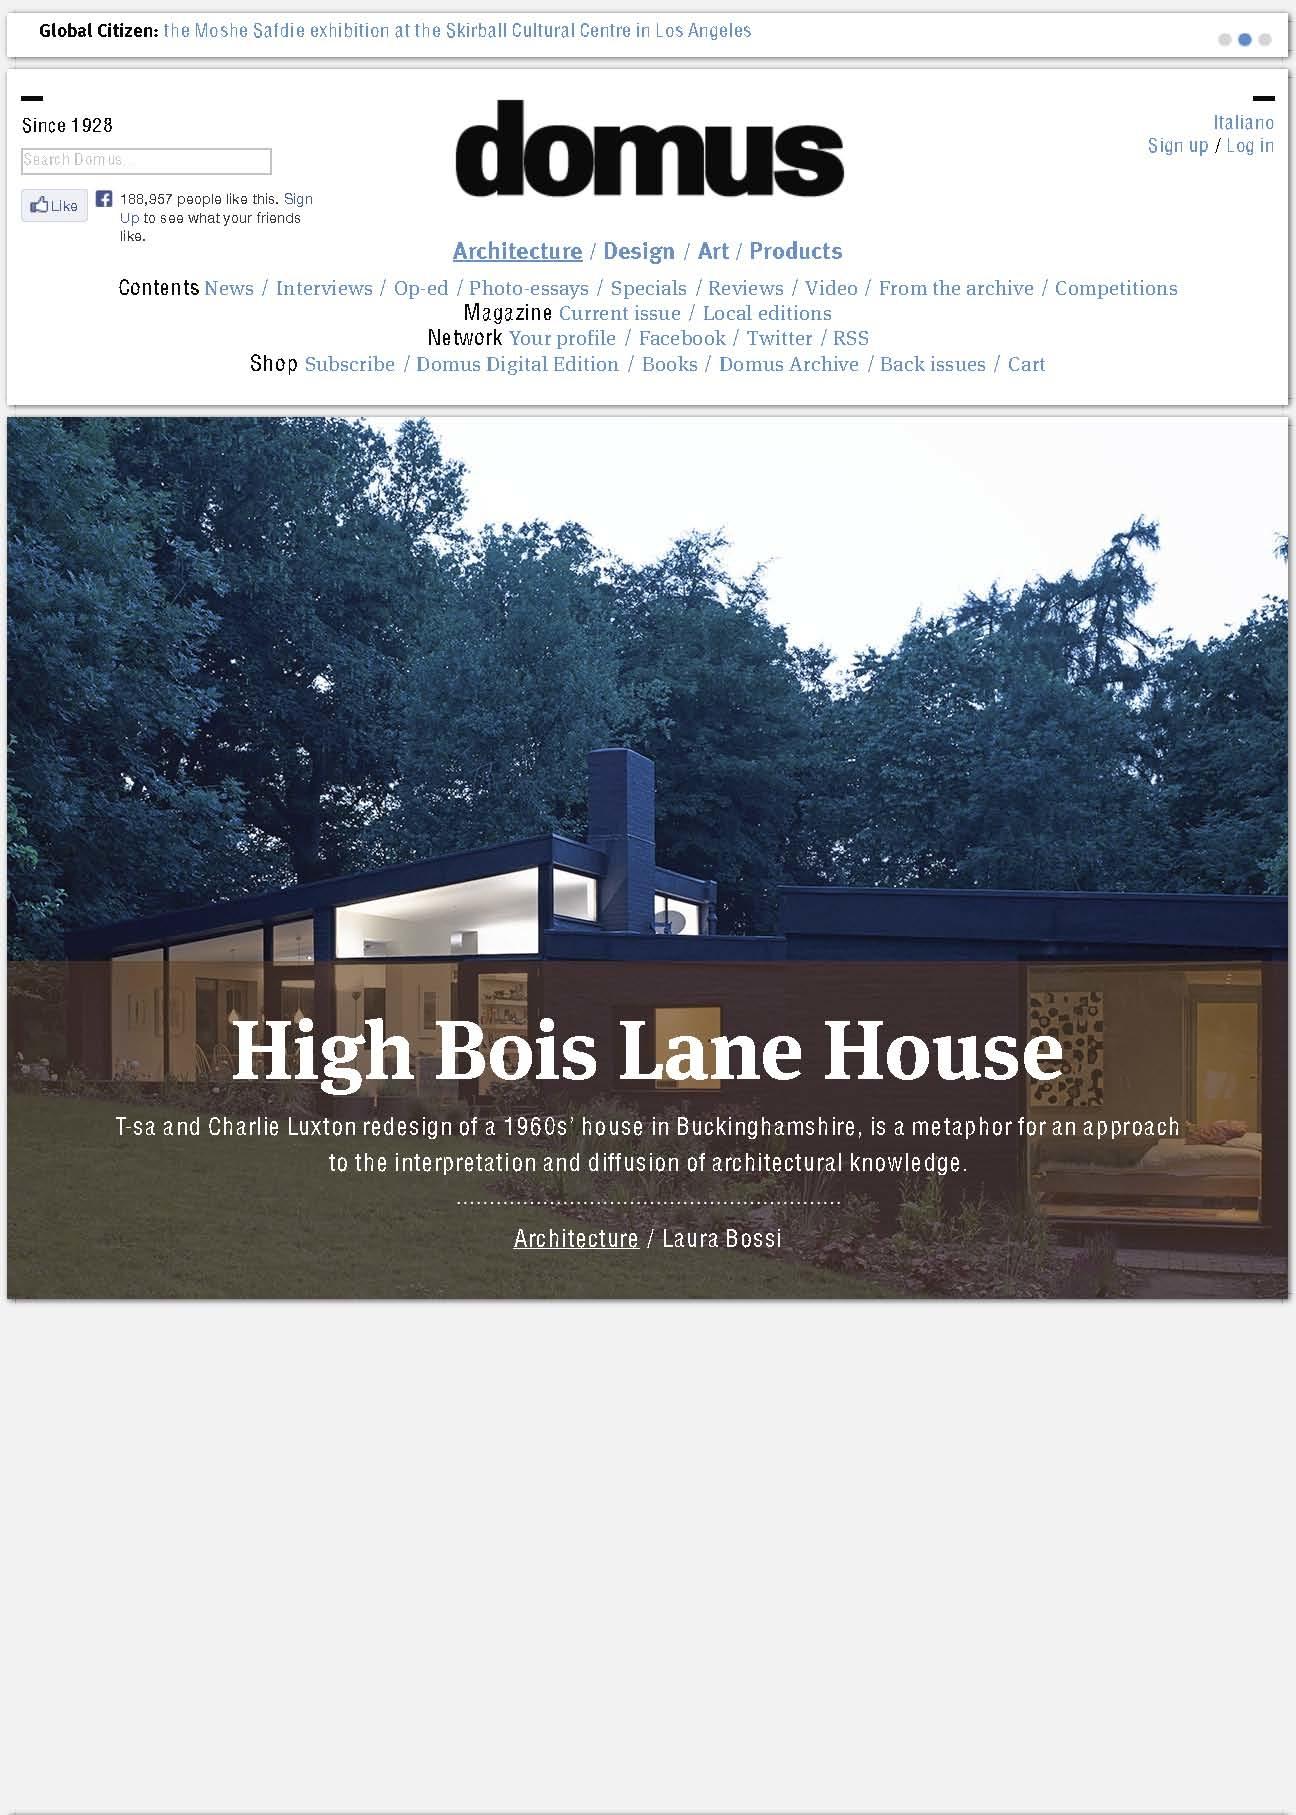 Domus_High Bois Lane1_1